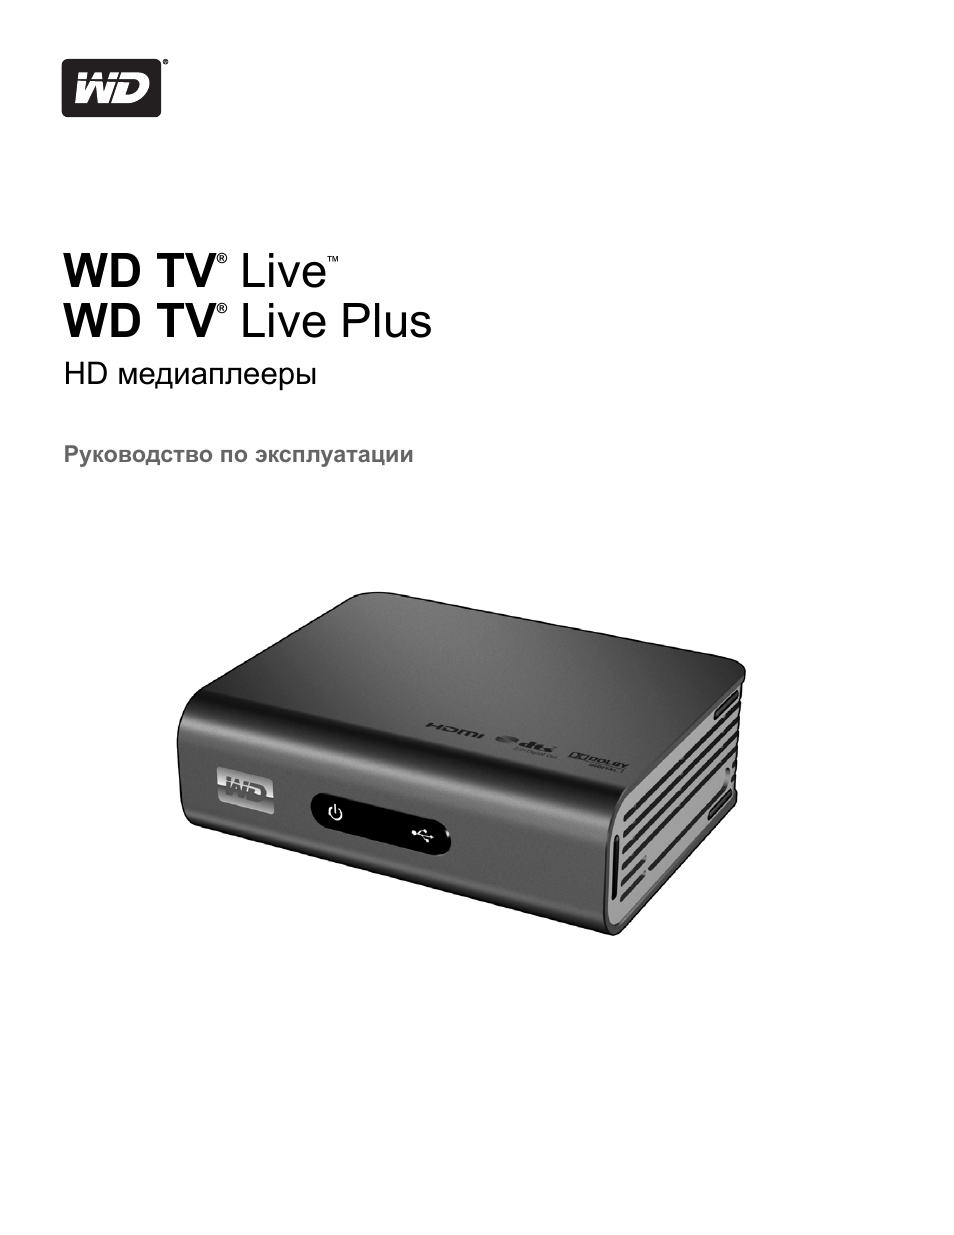 wd tv media player user manual